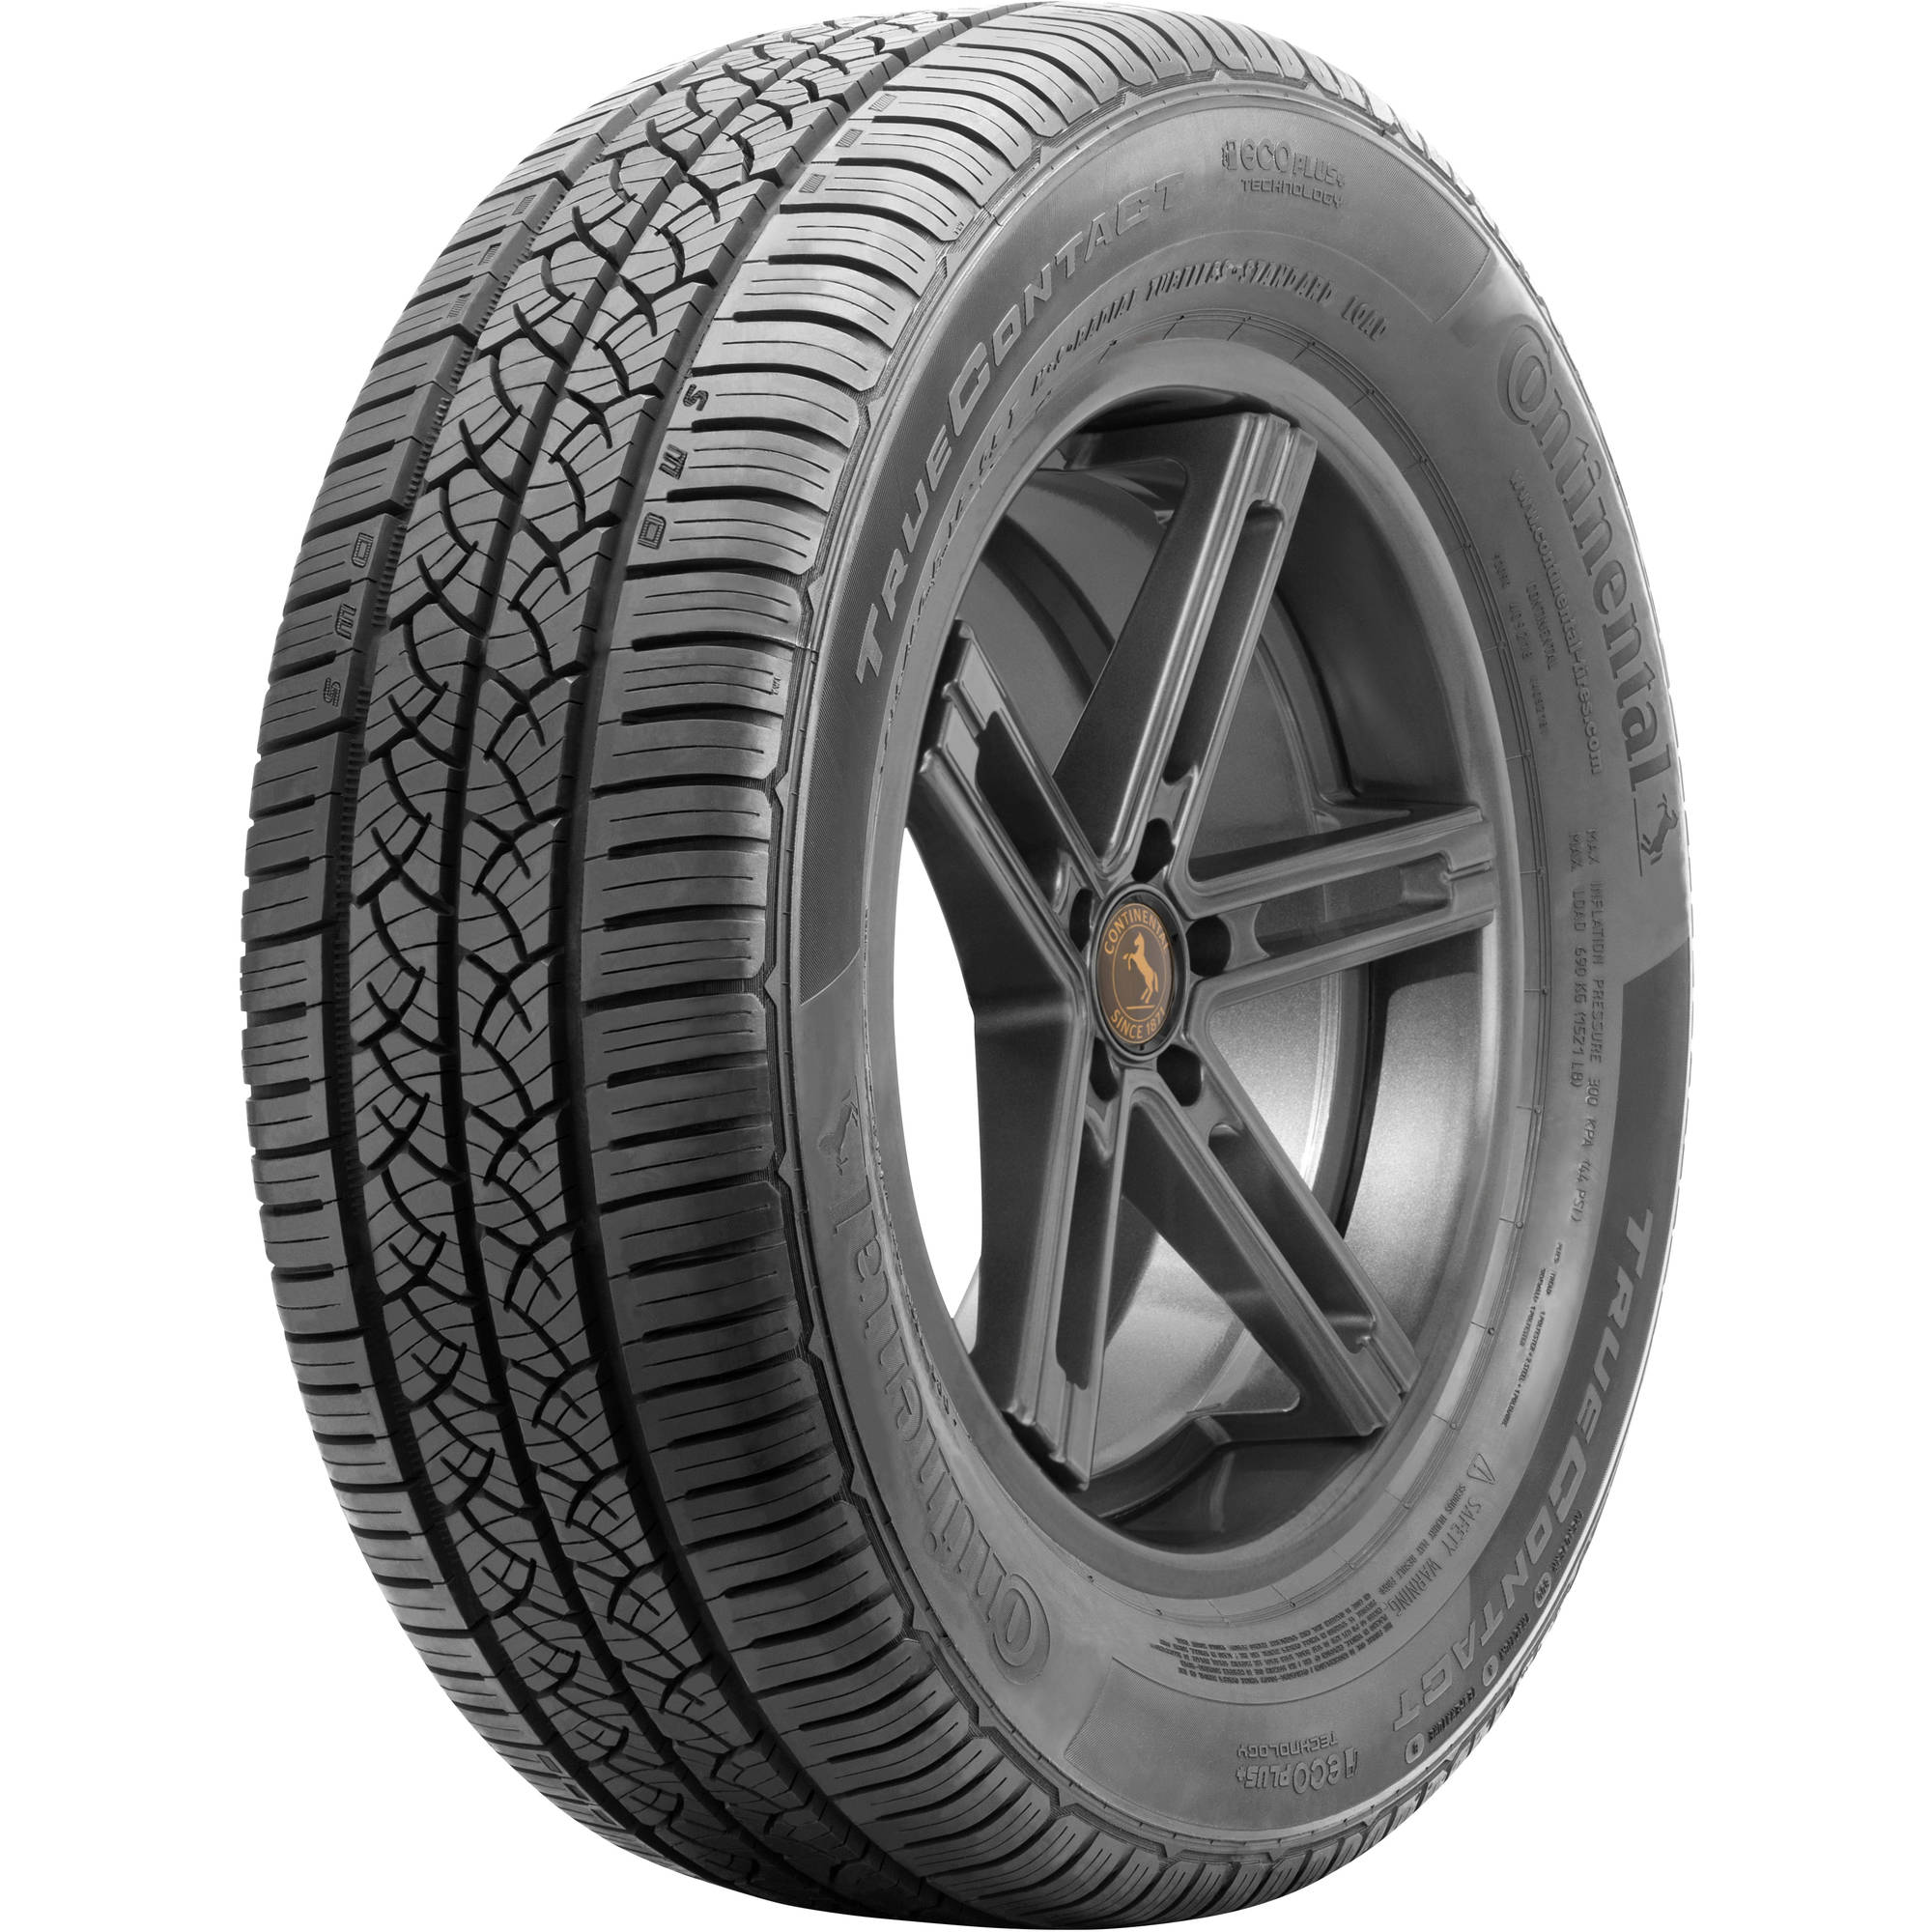 Continental Truecontact Tire 225/65R17 Tire 102T